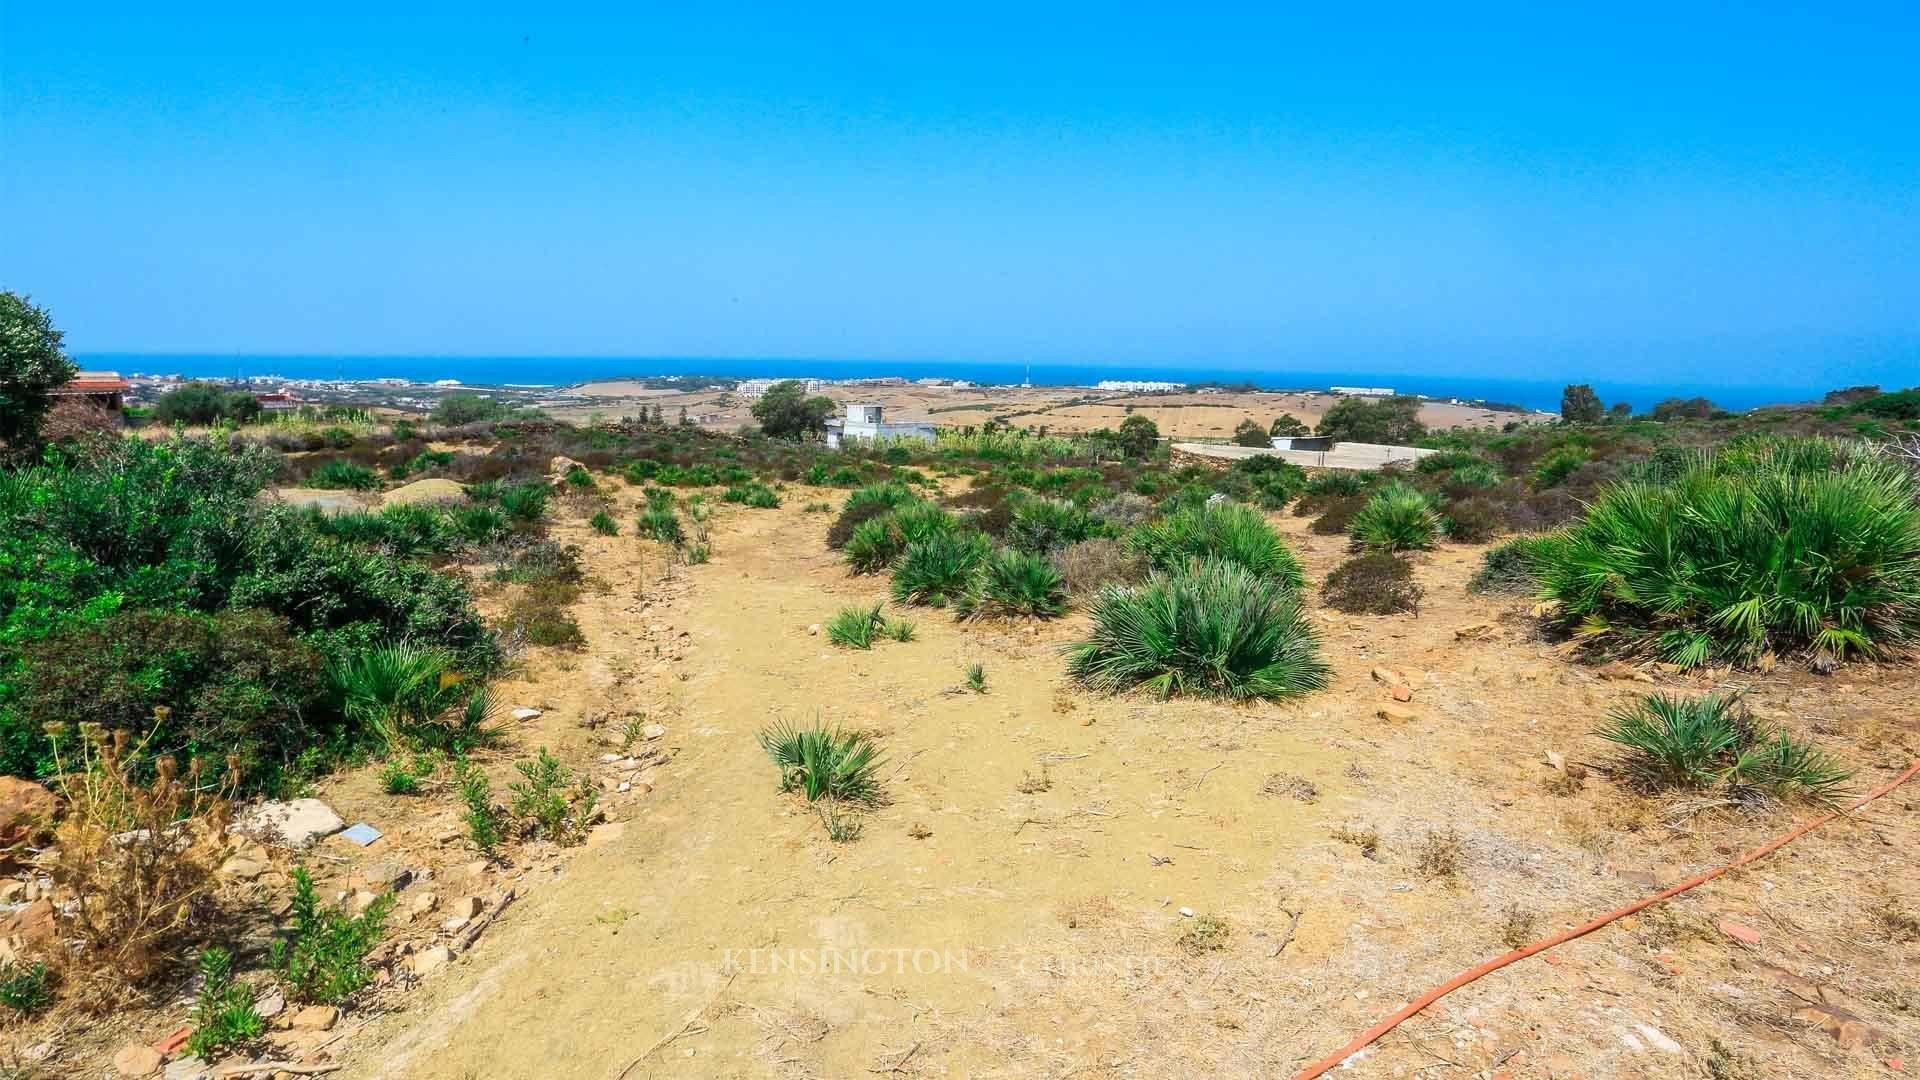 KPPM01273: Terrain constructible Tita Terrain constructible Tanger Maroc